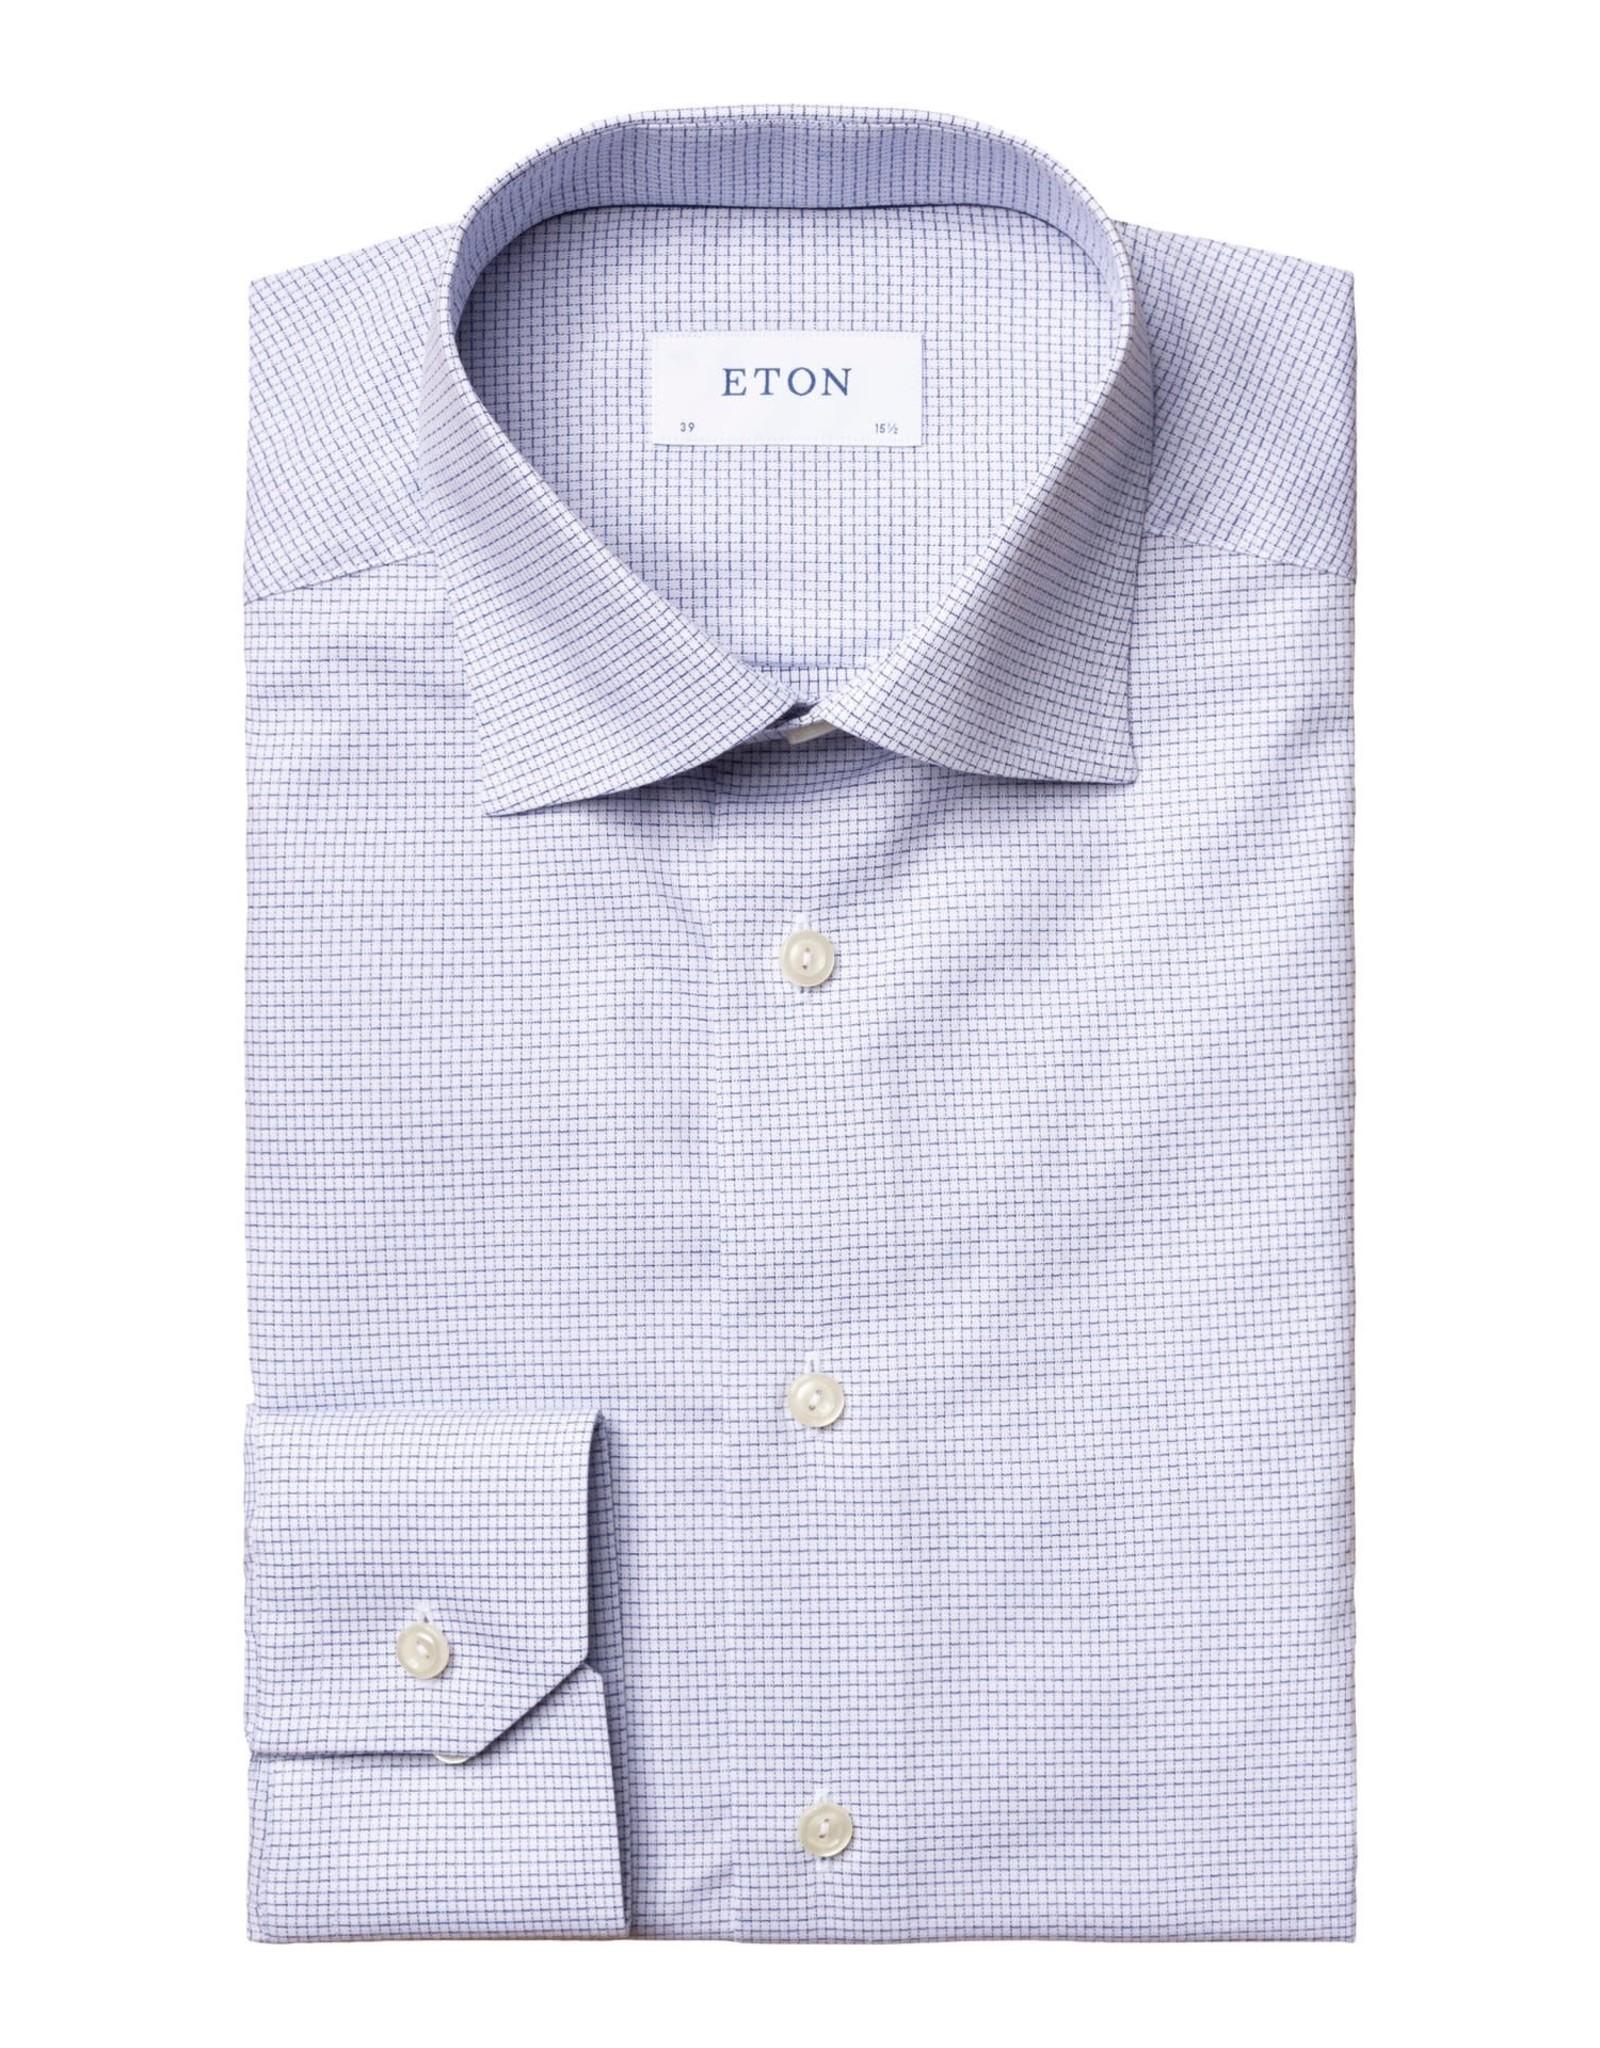 Eton Eton hemd wit-blauw contemporary 1193/29